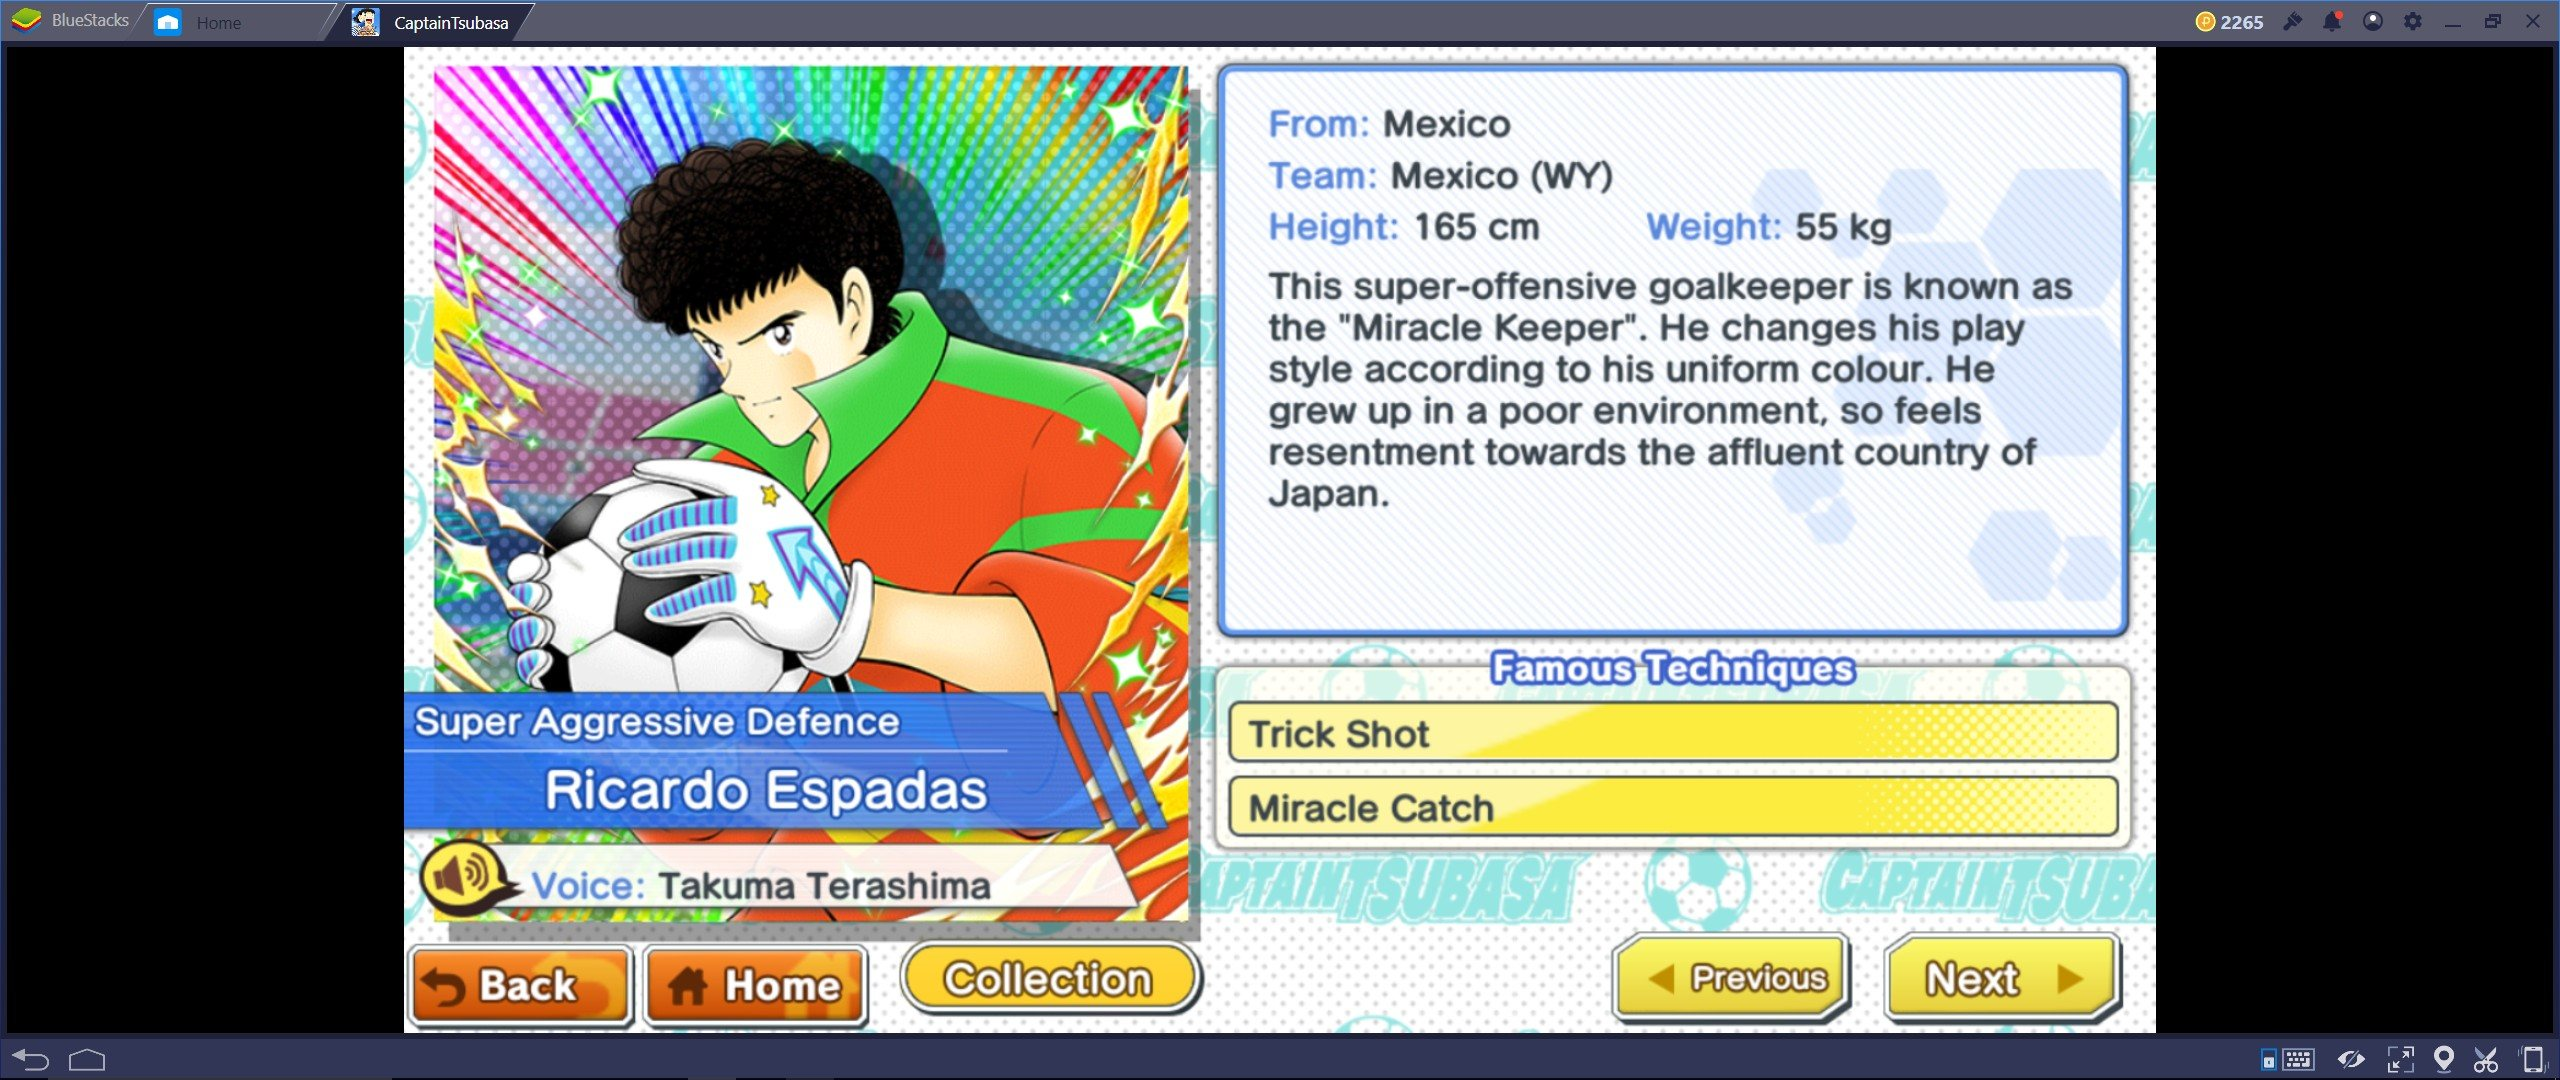 Captain Tsubasa: Dream Team – Những huyền thoại World Cup 'ẩn mình' trong game (Kỳ 2)